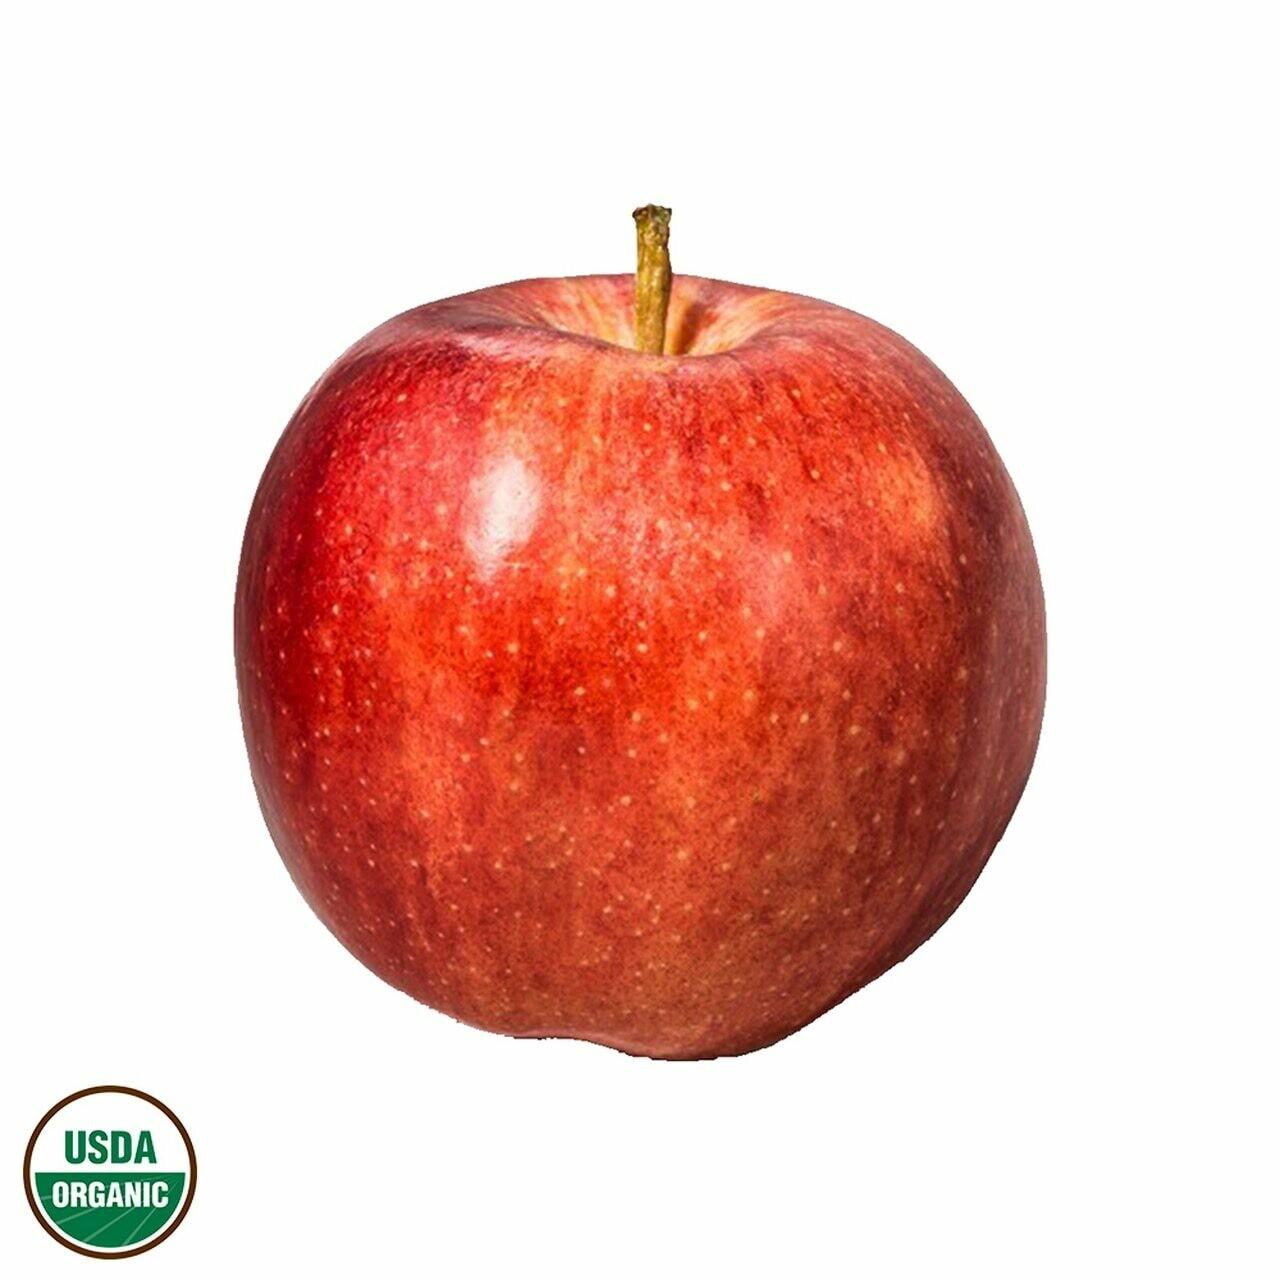 Produce / Fruit / Organic Gala Apple